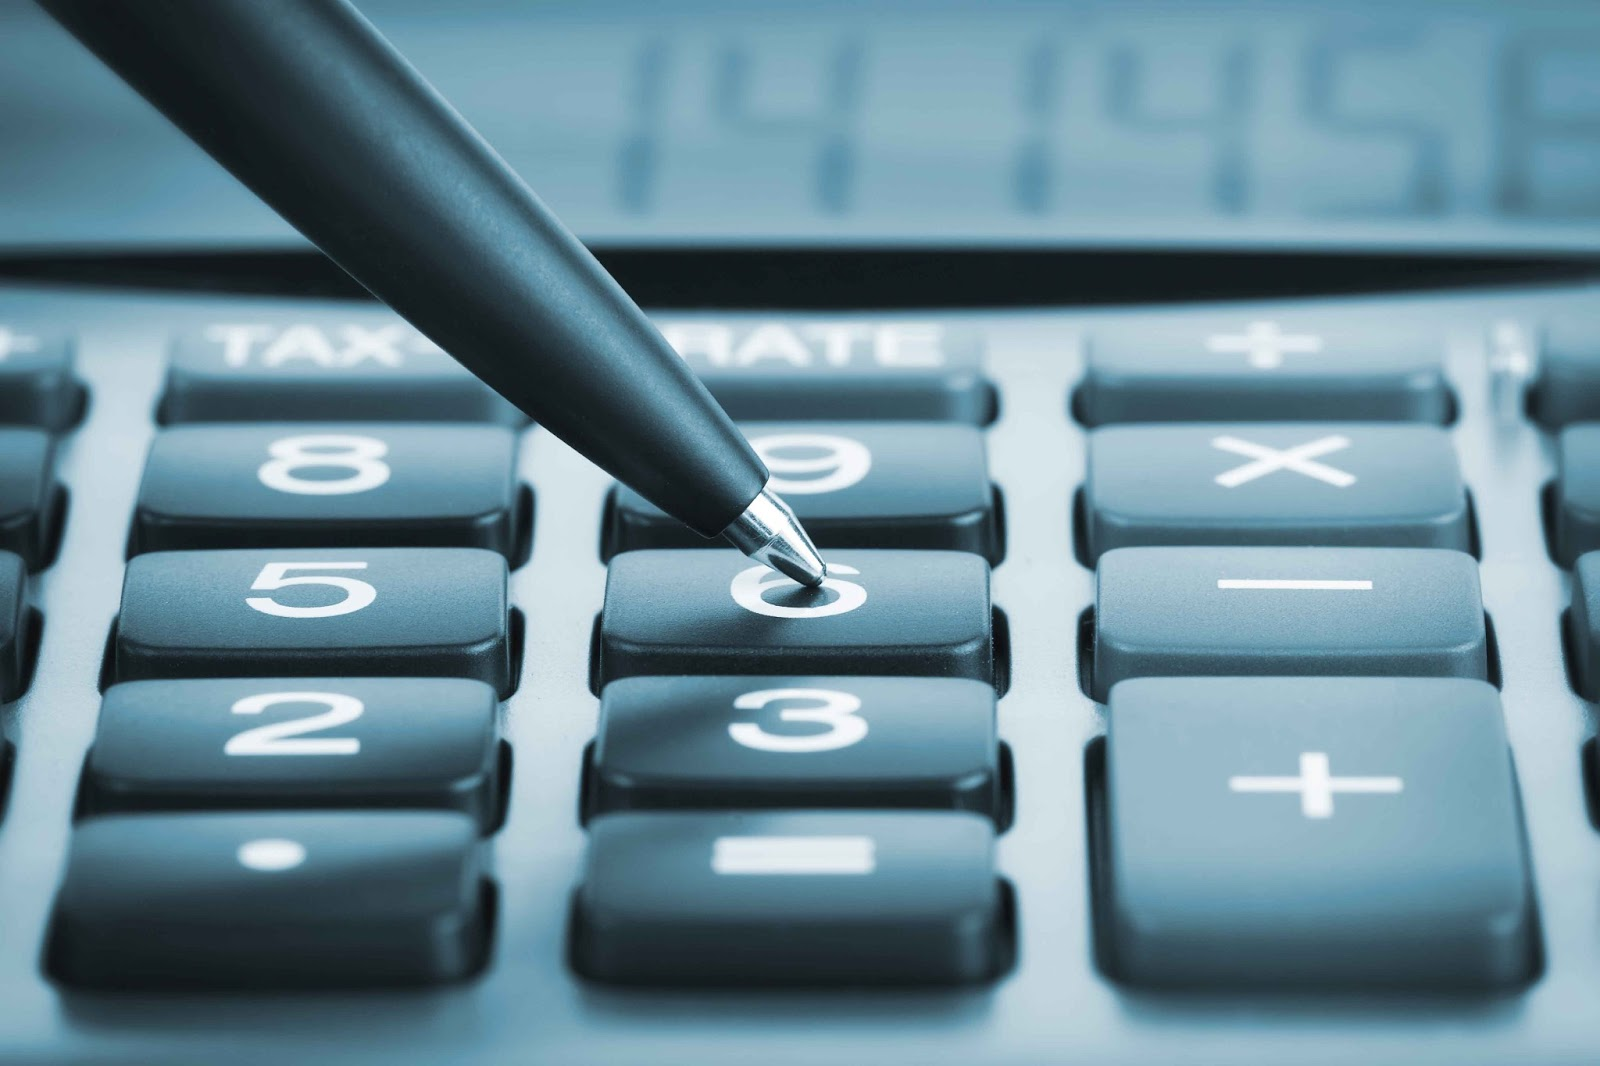 Sucessivos Refis tornam elisão fiscal vantajosa